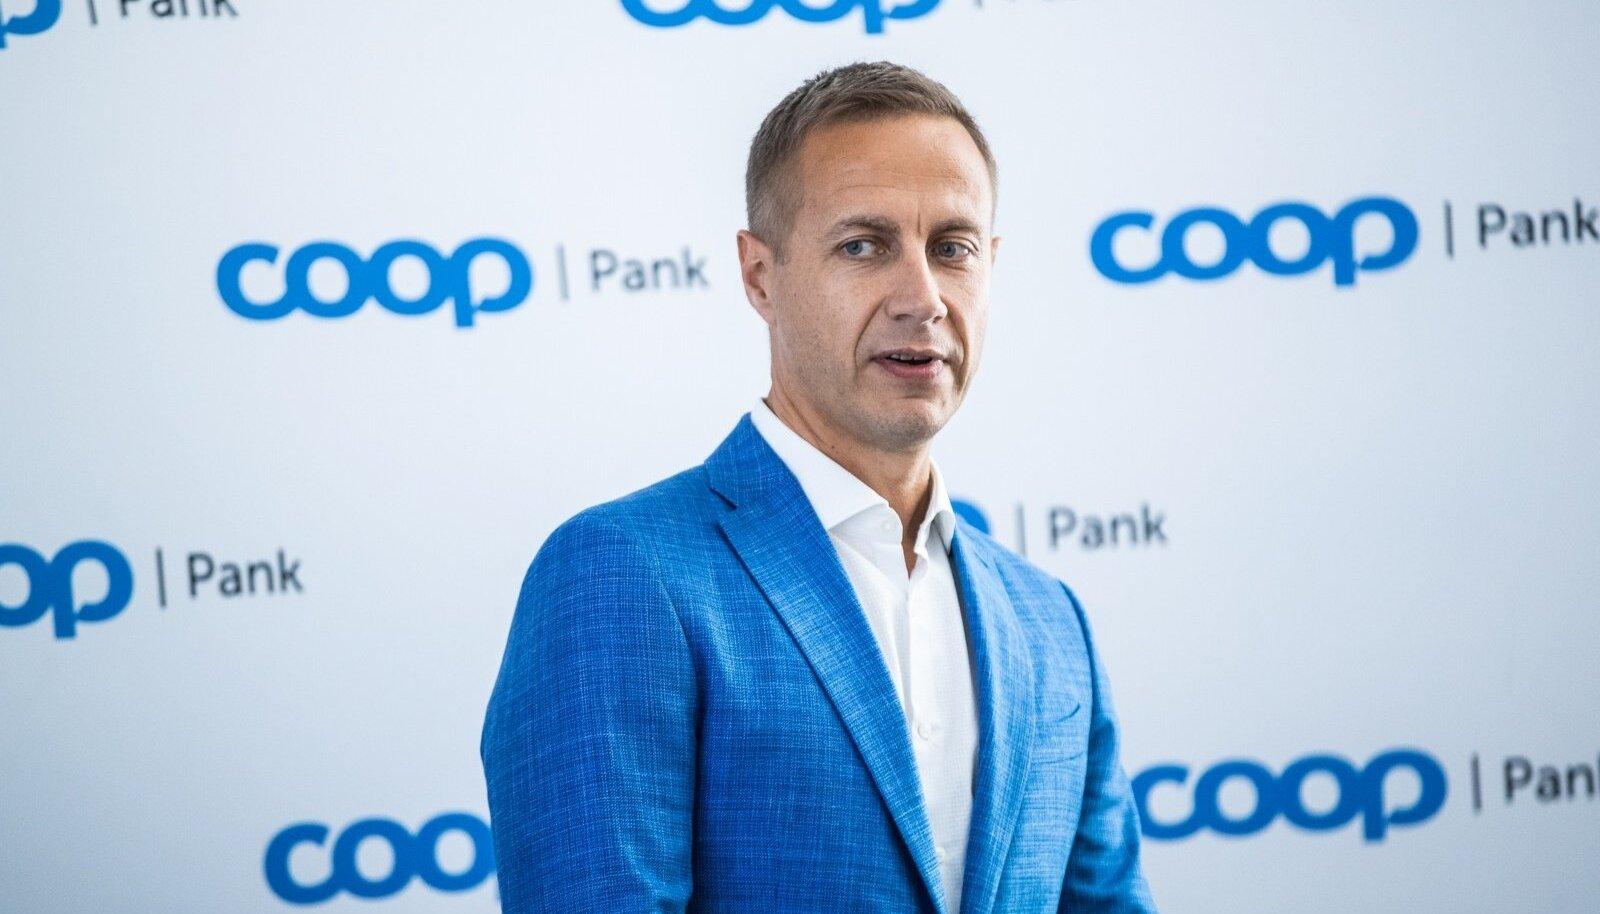 Coop Panga juhatuse esimees Margus Rink